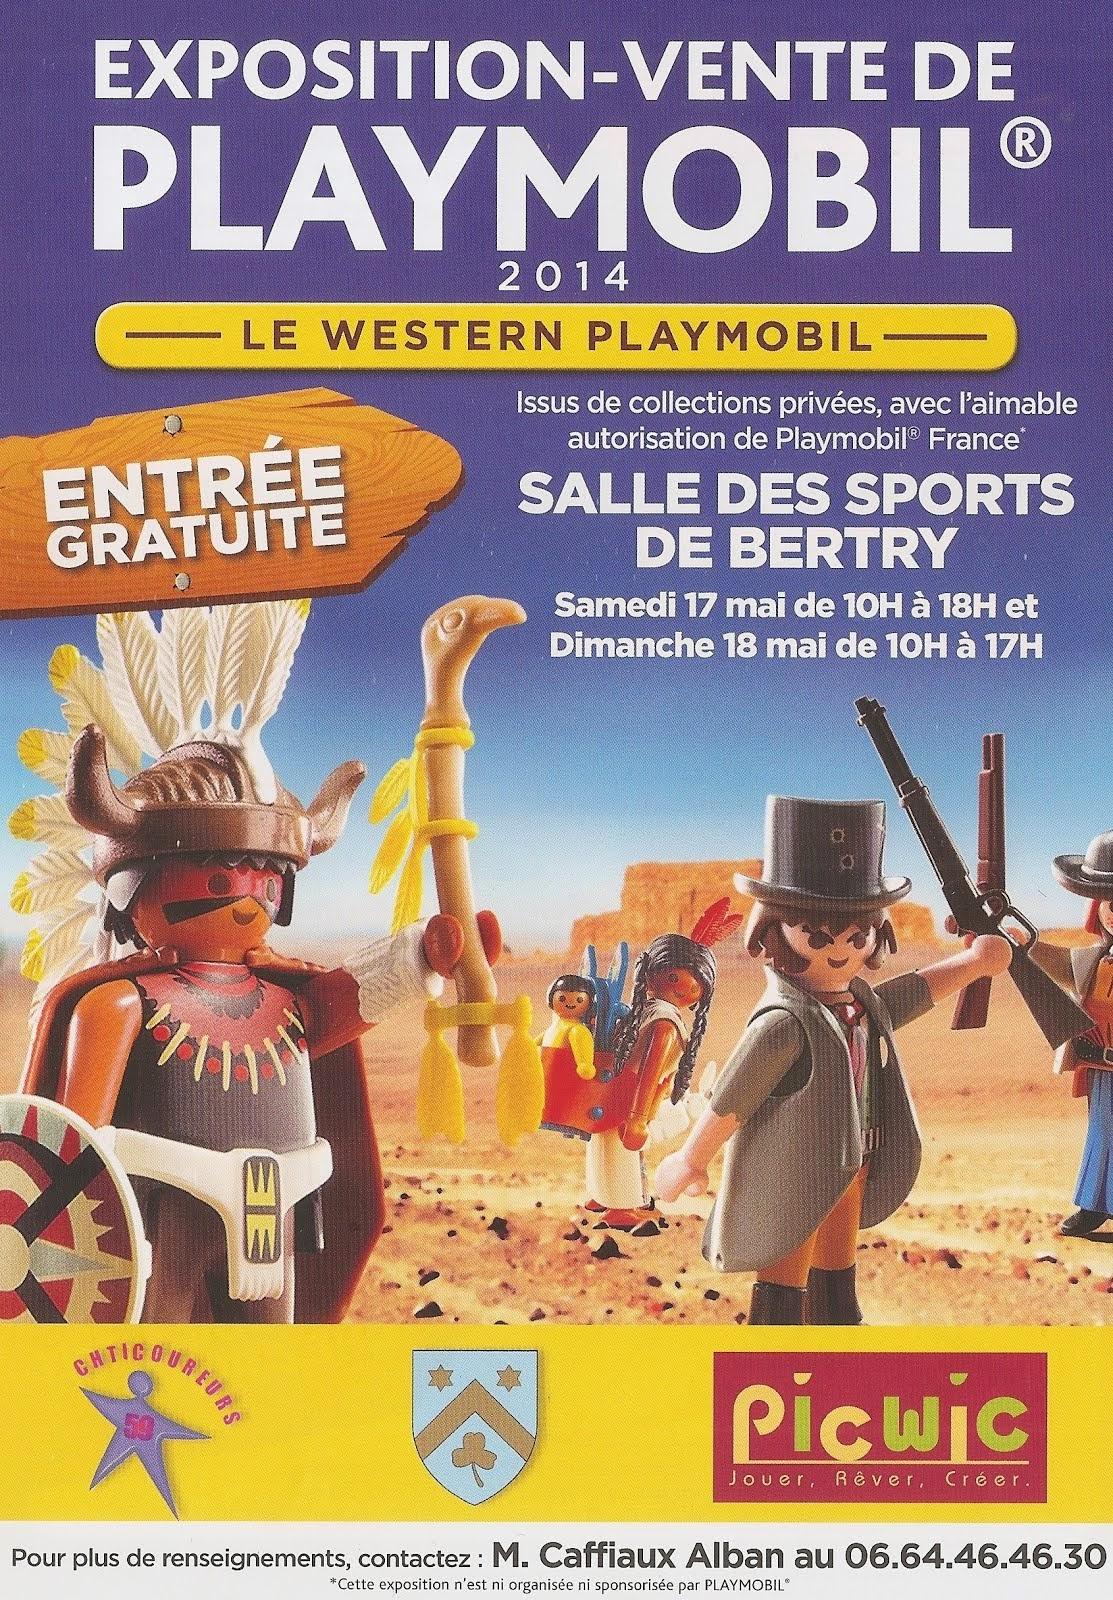 Expo-Vente Bertry, 16-18 Mai 2014